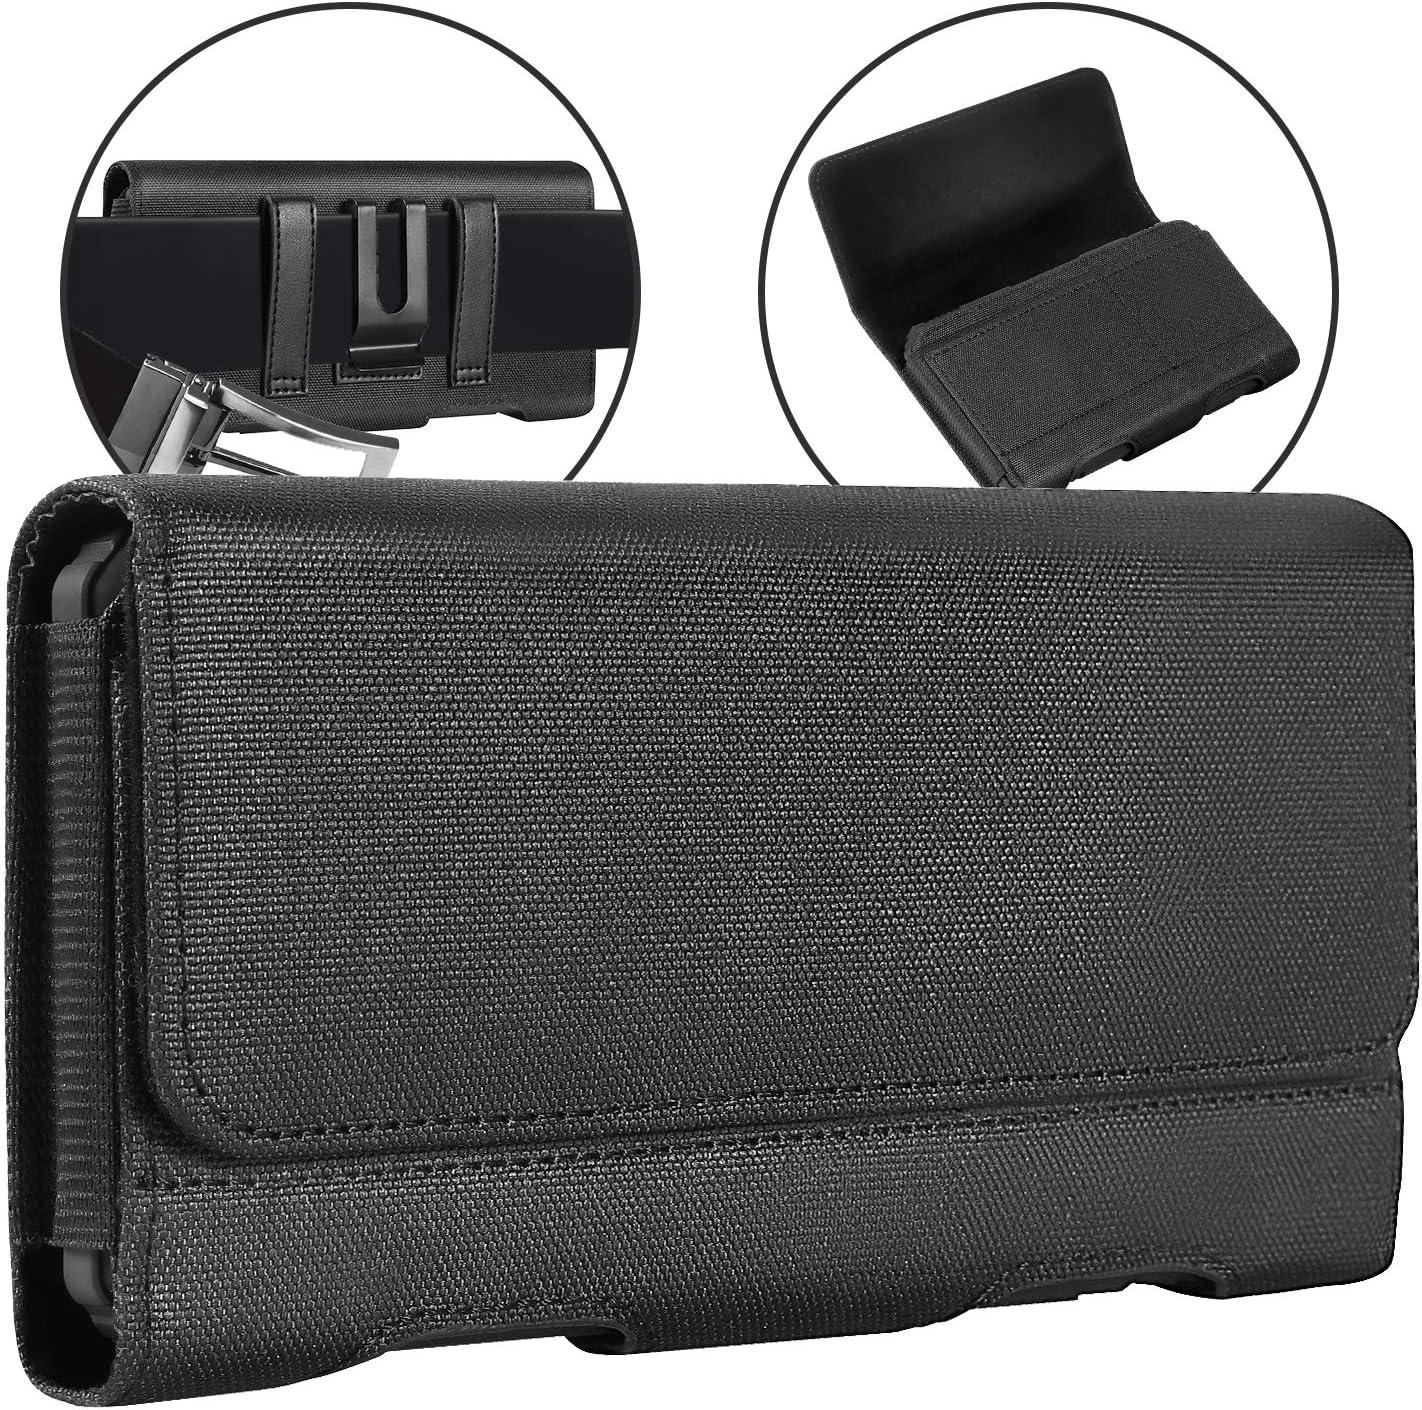 BECPLT for Galaxy S21+ 5G Belt Clip Case, Nylon Belt Clip Case Holster Pouch Holder Cover for Moto G8 Plus Samsung Galaxy M21s S20 FE 5G A51 5G A50 A30 A20 - Built in ID Card Slot Wallet Case - Black